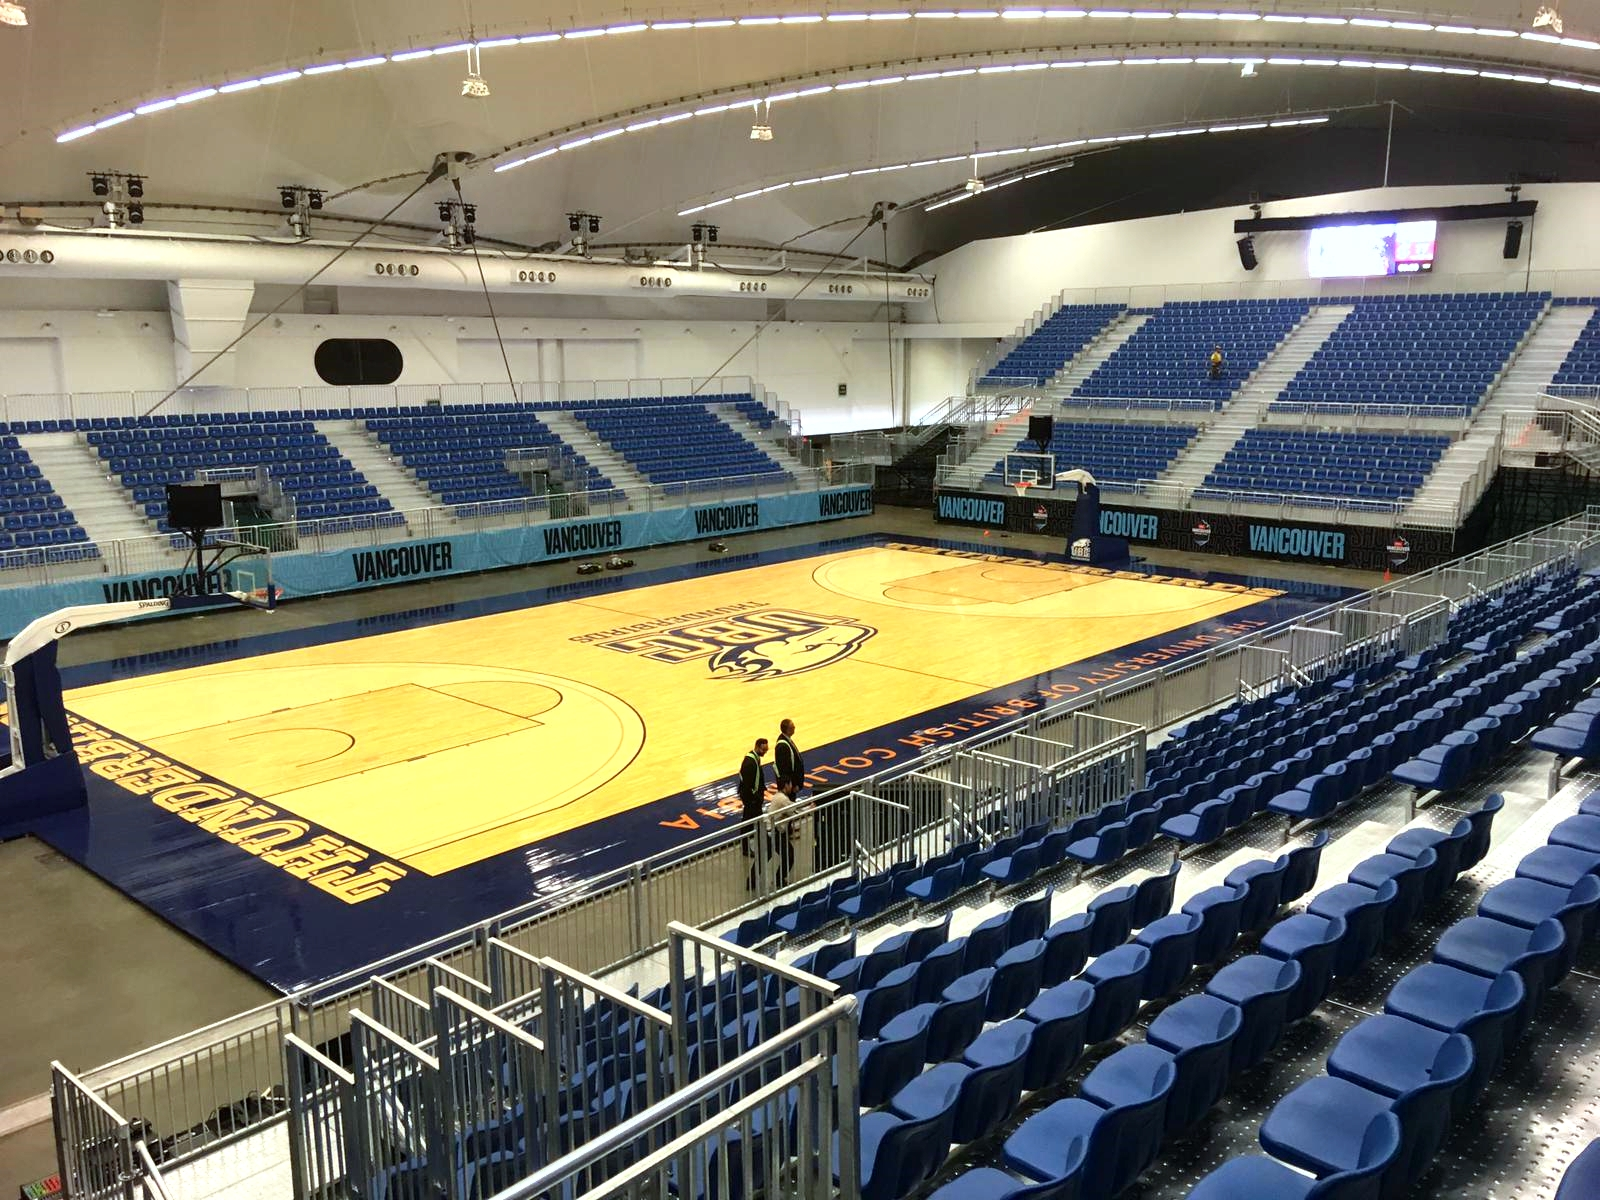 Indoor grandstand basketball hall modular temporary stand